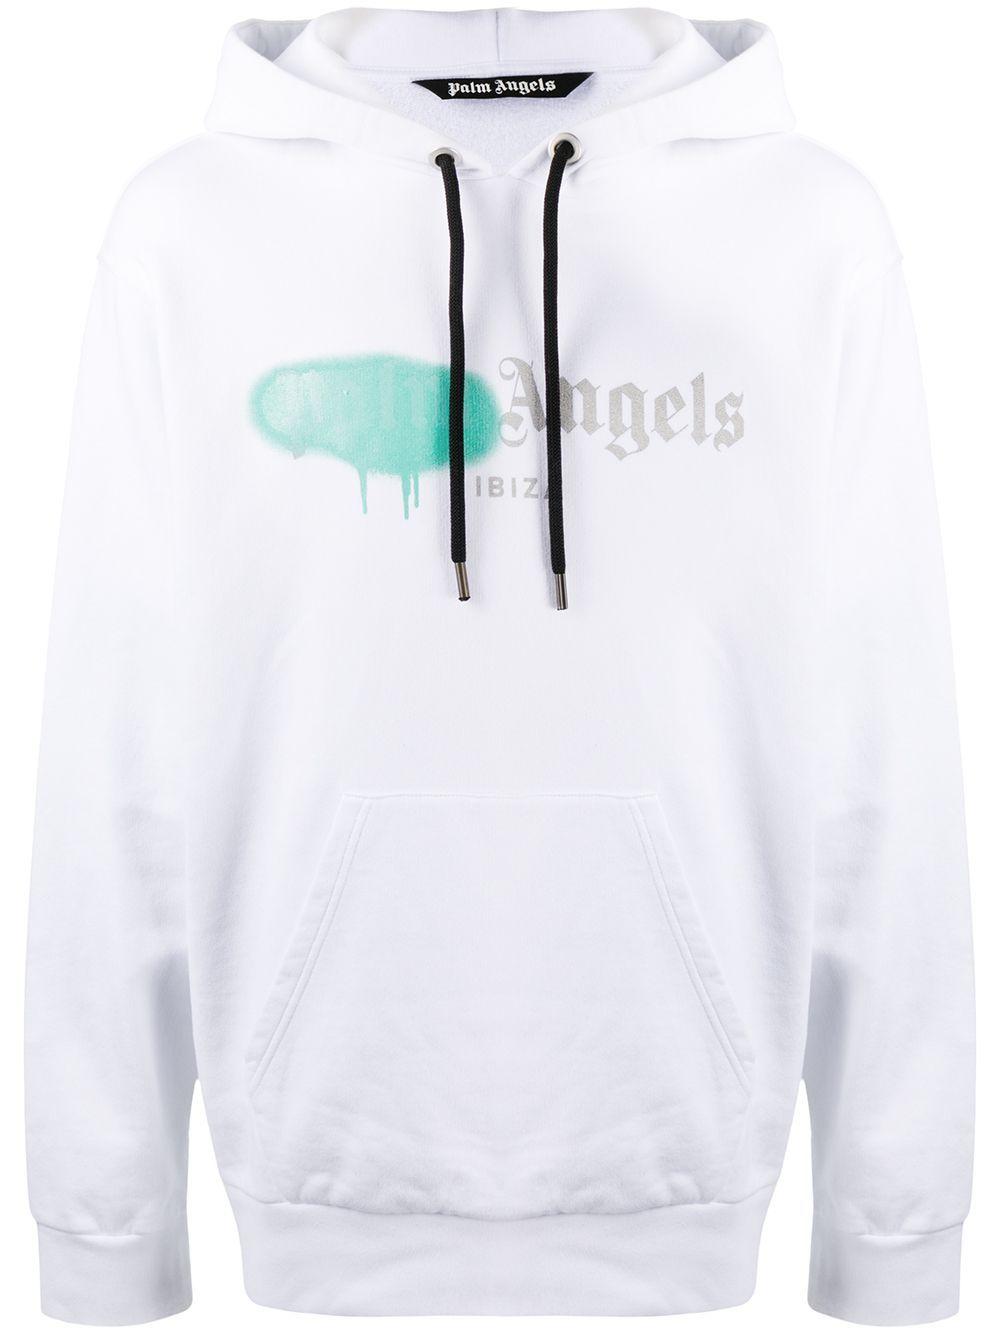 Palm Angels Ibiza Sprayed Hoodie Farfetch In 2021 Sick Clothes Hoodies Palm Angels [ 1334 x 1000 Pixel ]